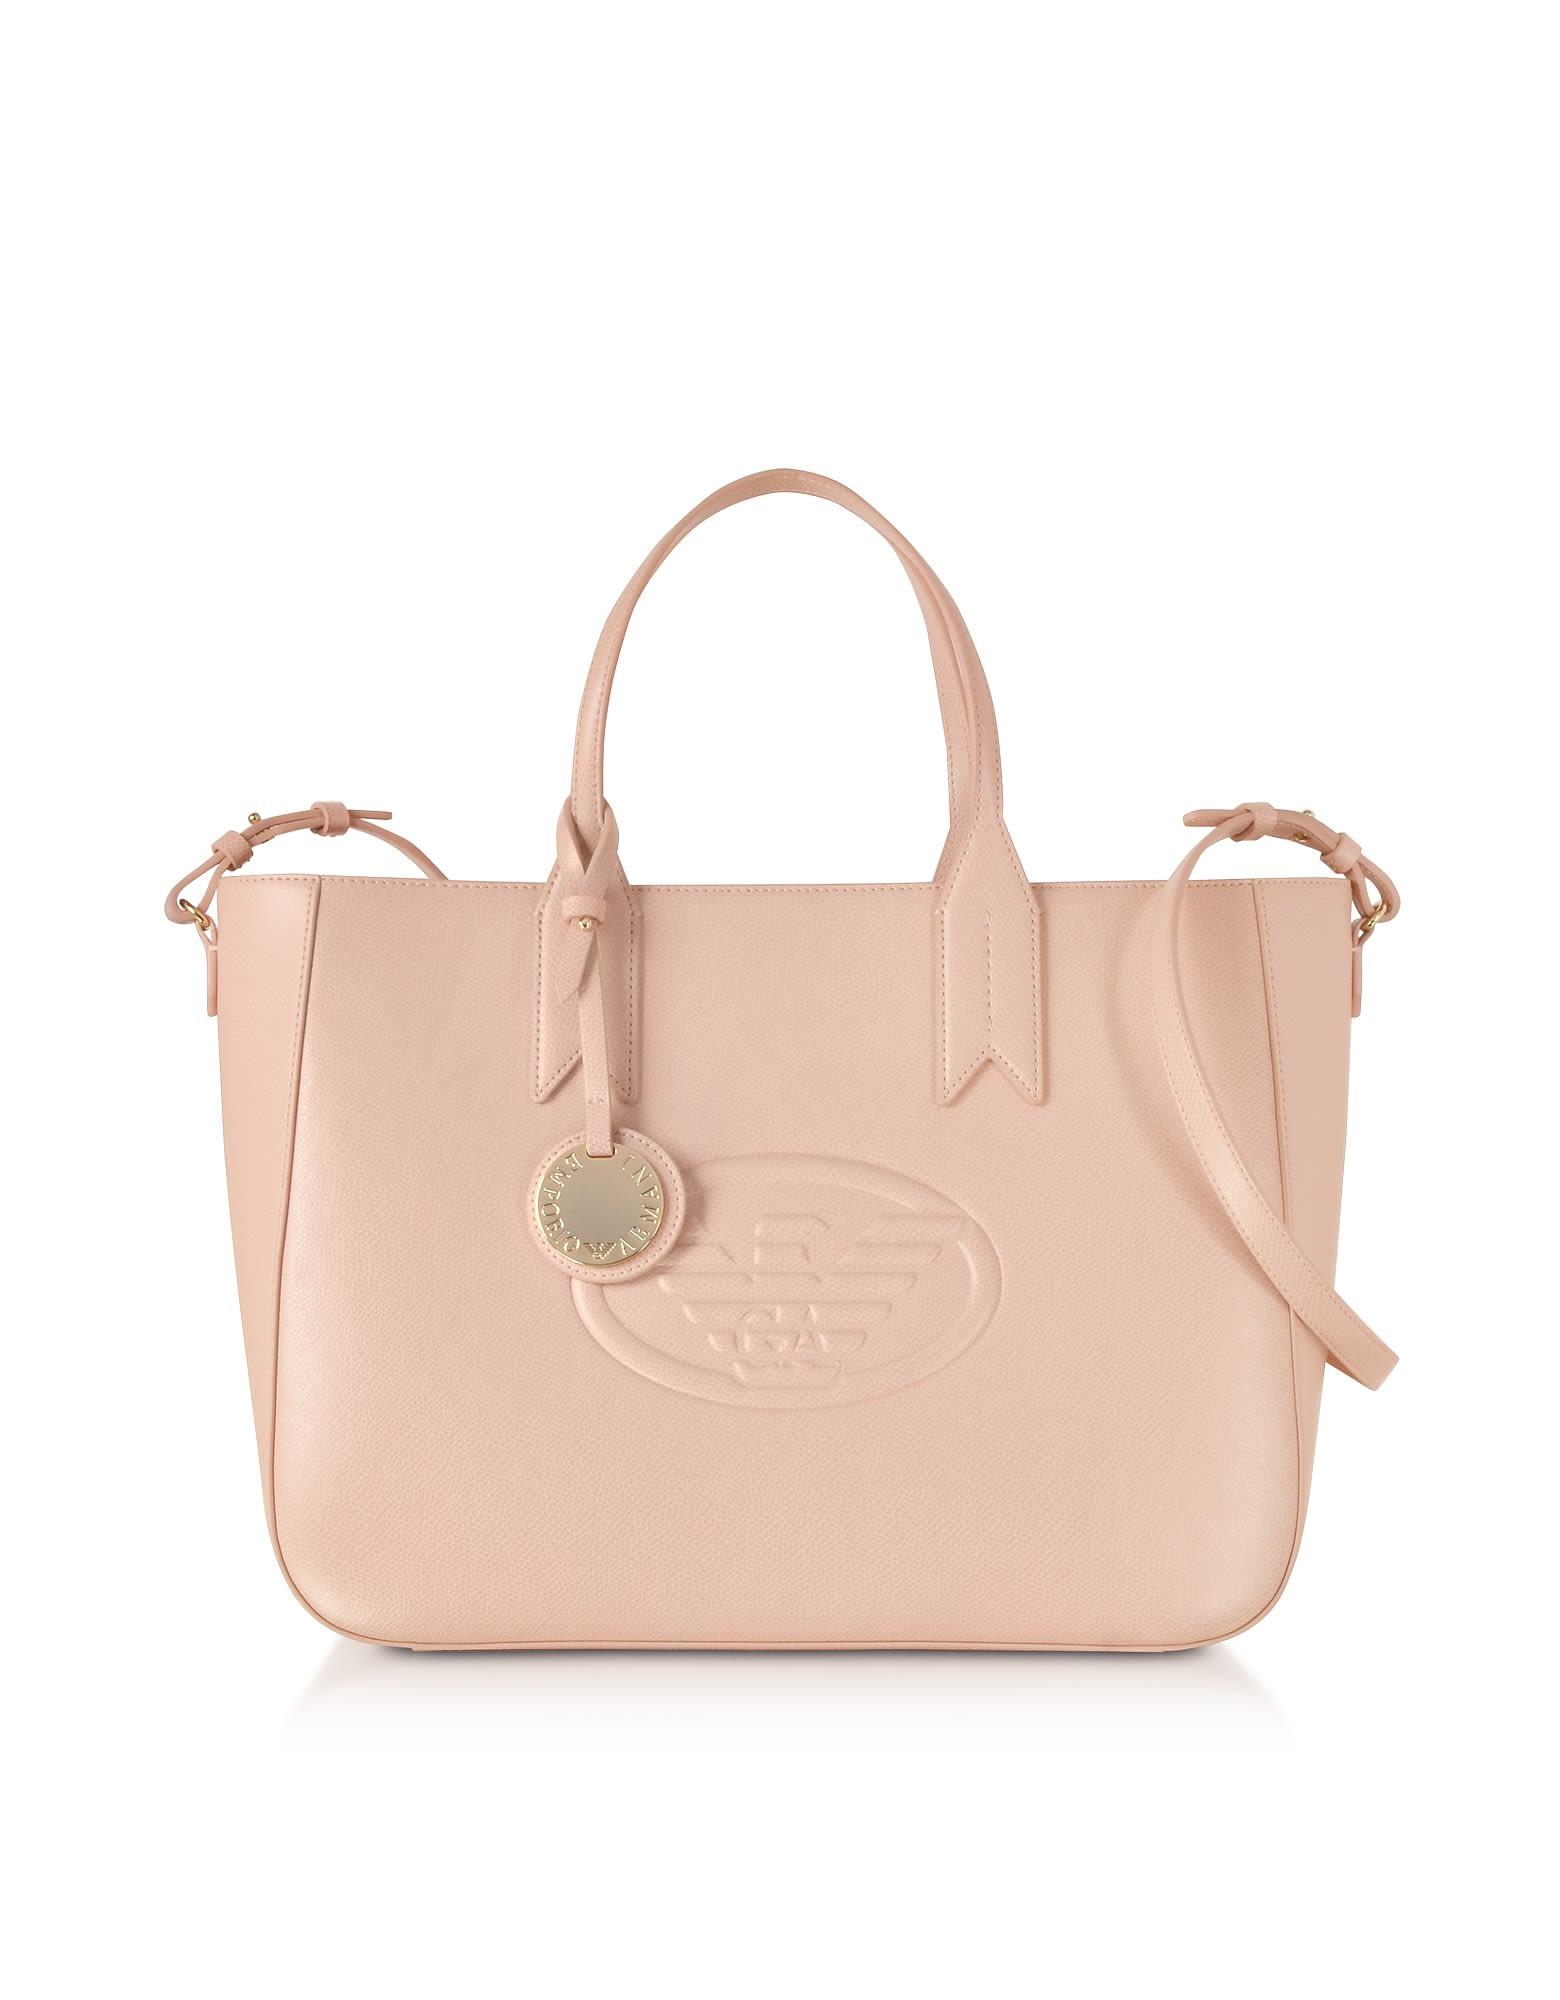 ed7cb4ec6526 Emporio Armani Emporio Armani Medium Embossed Eco Leather Tote Bag ...